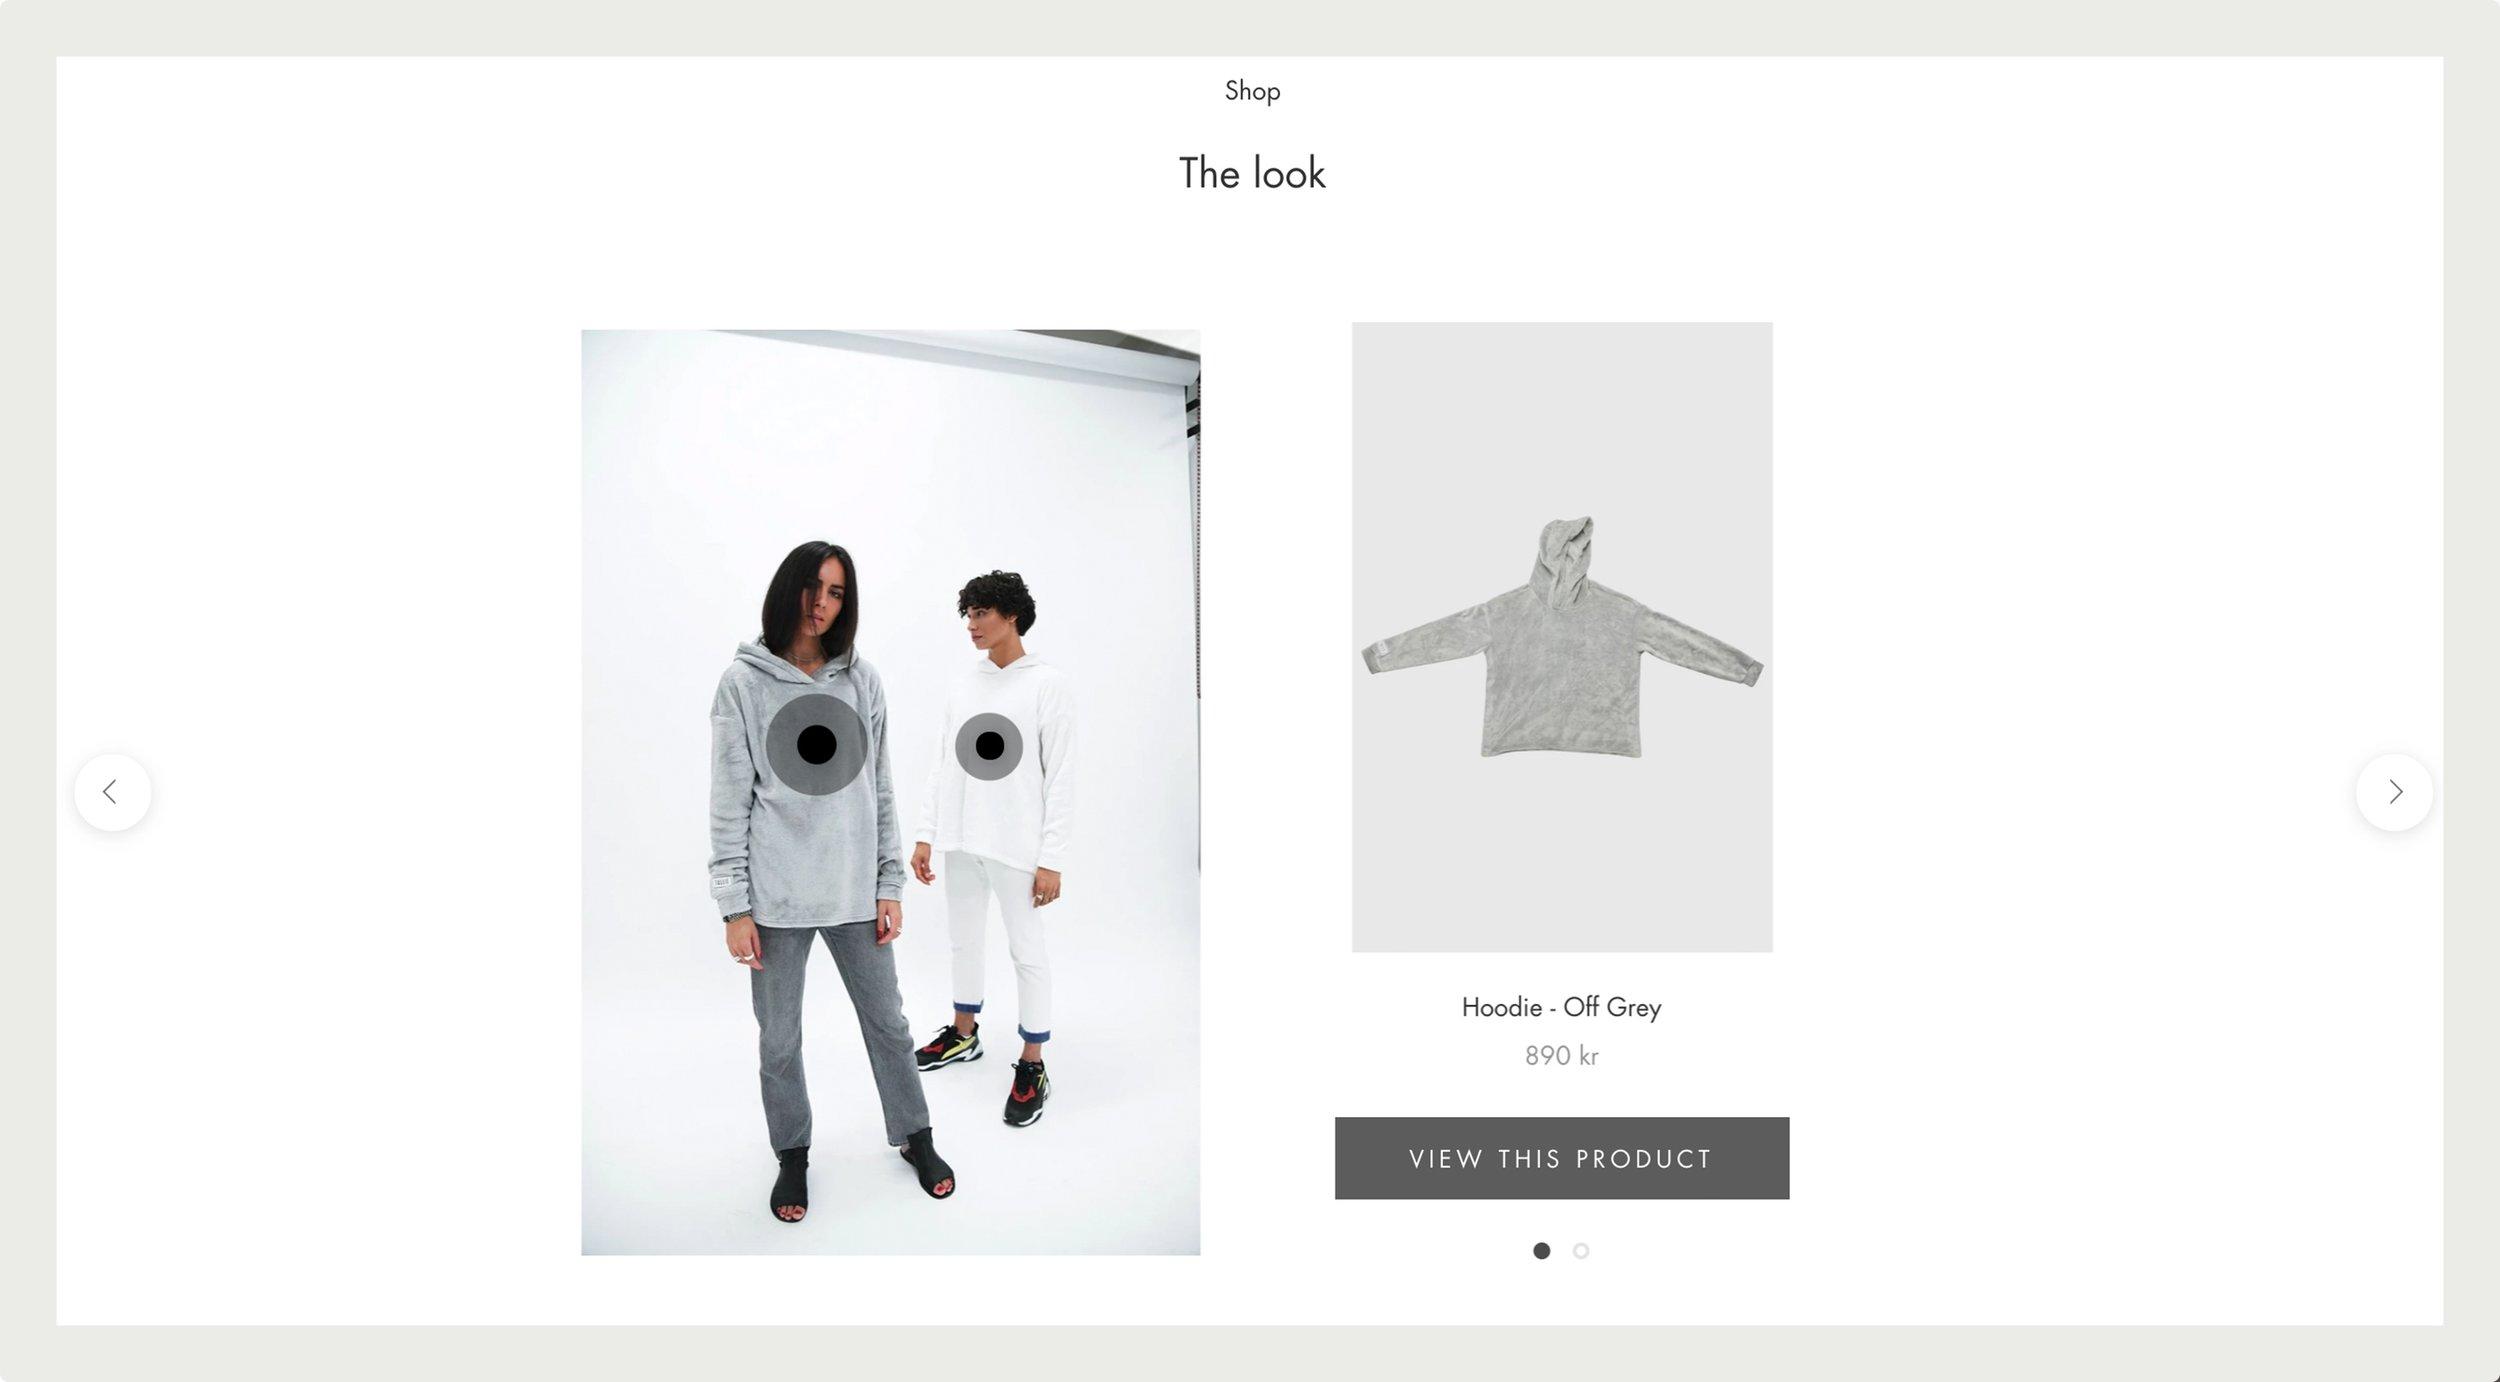 framtidens-webbyrå-e-handel-tallie-shop-the-look.jpg